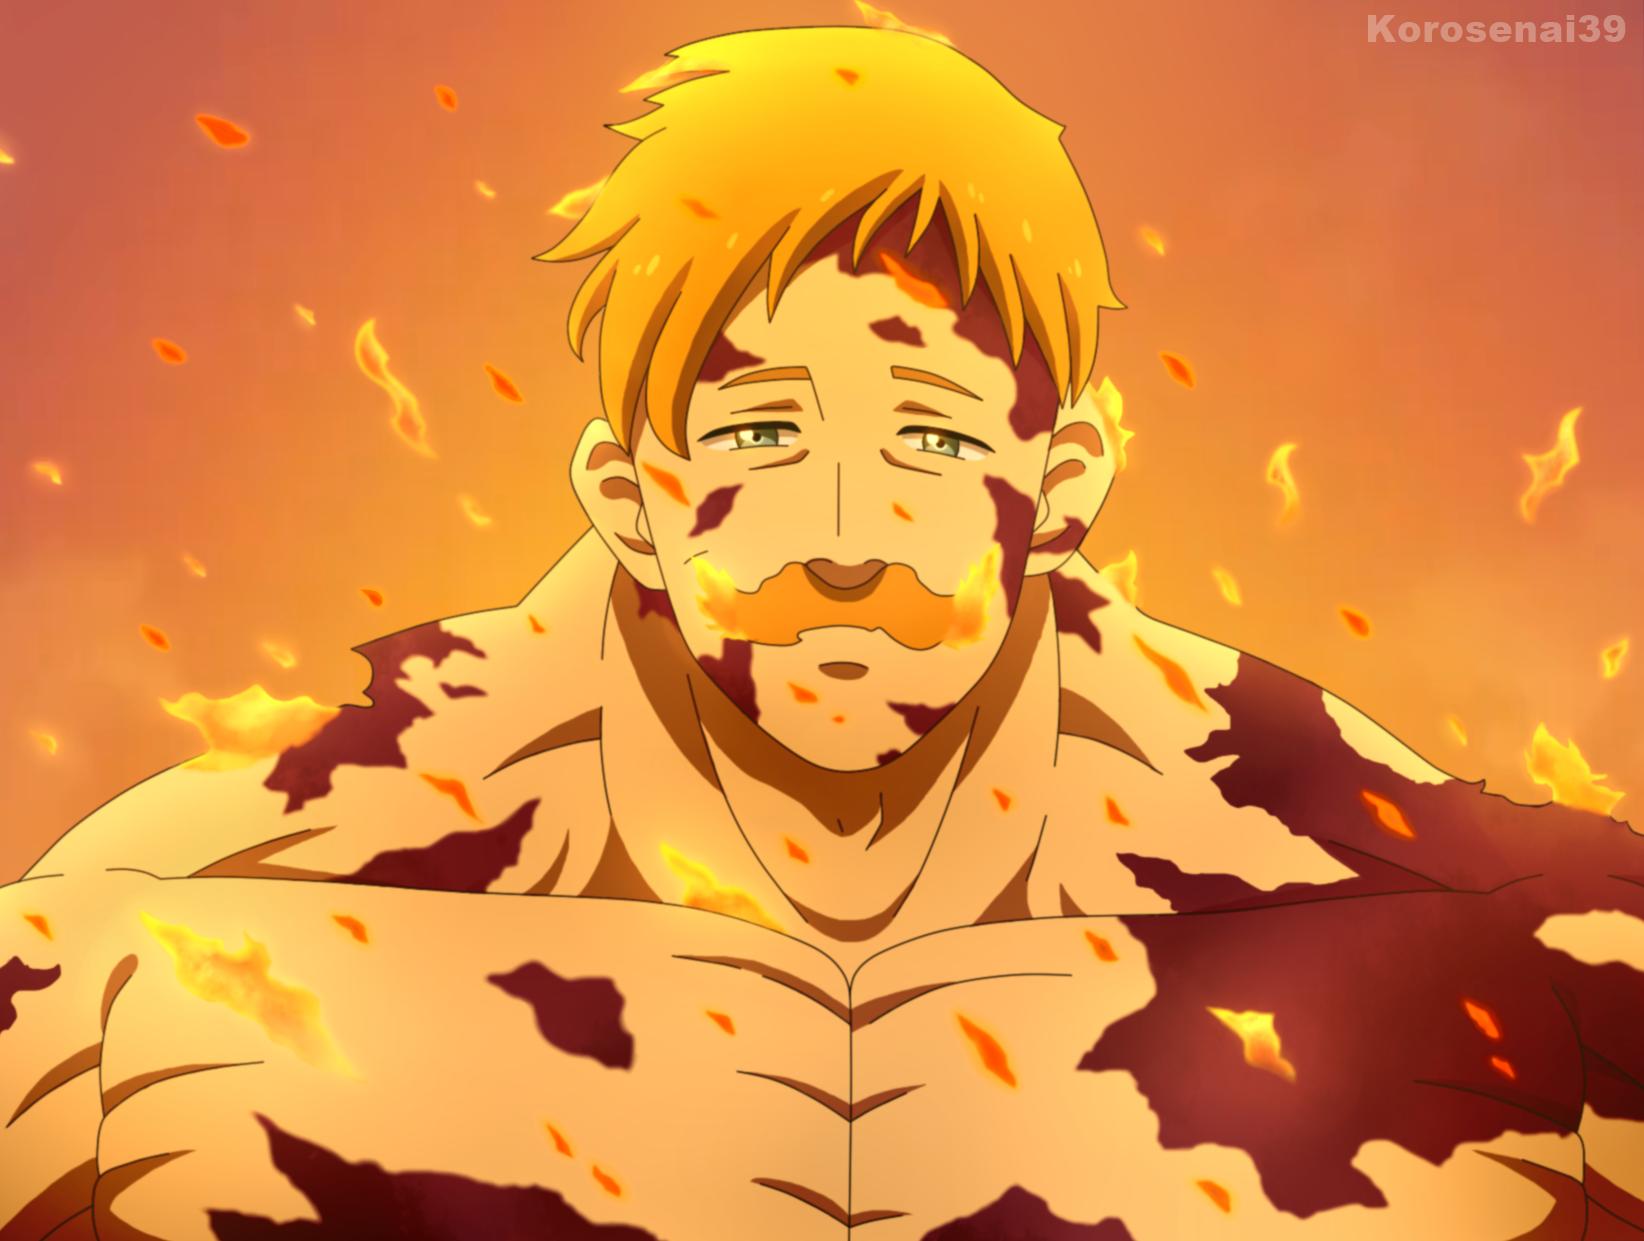 Escanor Nanatsu No Taizai By Korosenai39 On Deviantart In 2020 Seven Deadly Sins Anime Cyberpunk Anime Anime Chibi